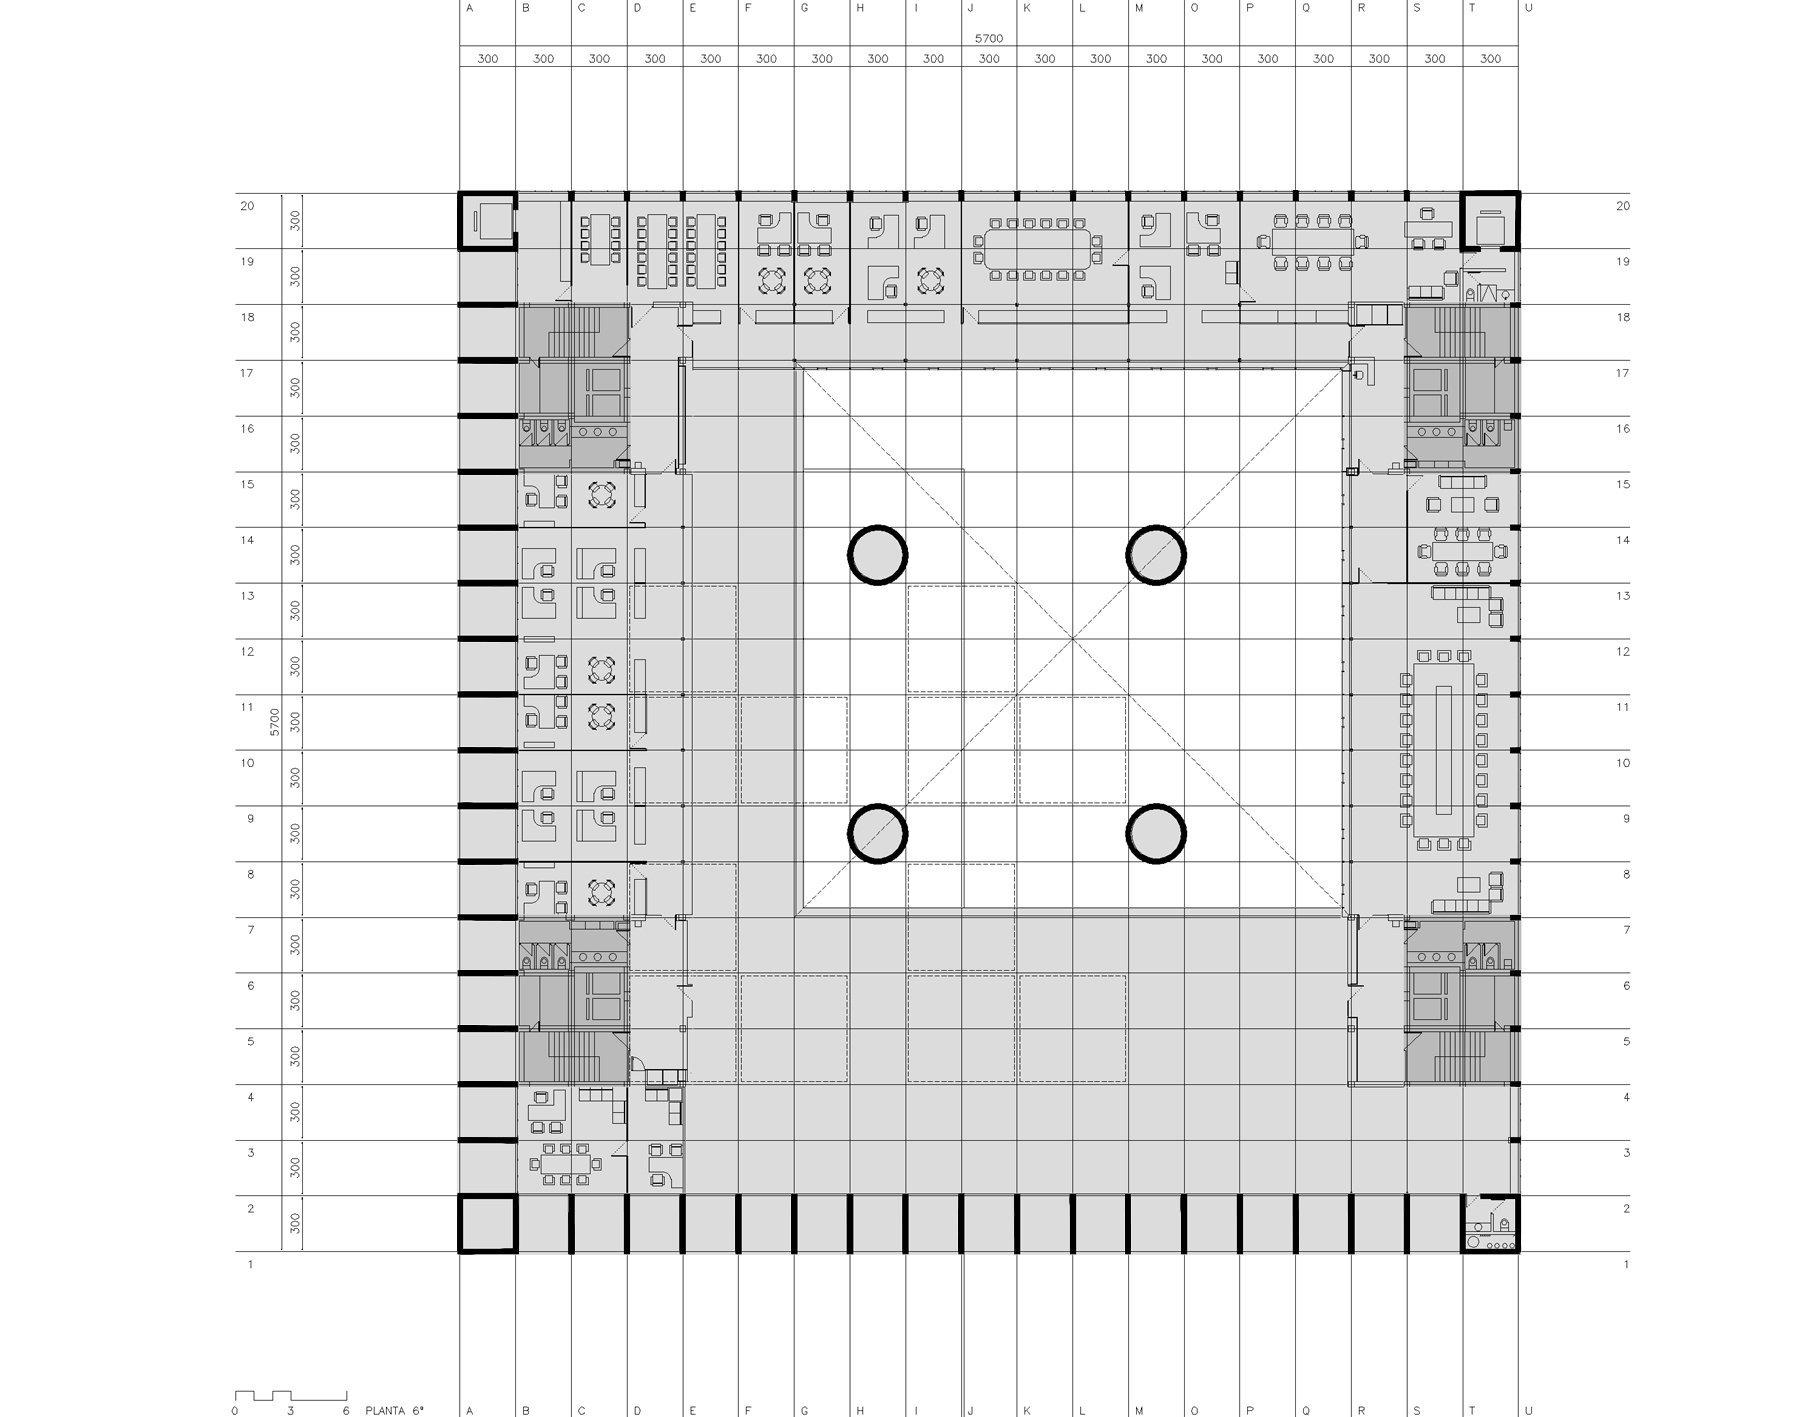 Cl sicos de arquitectura caja granada impluvium de luz alberto campo baeza plataforma - Campo baeza caja granada ...